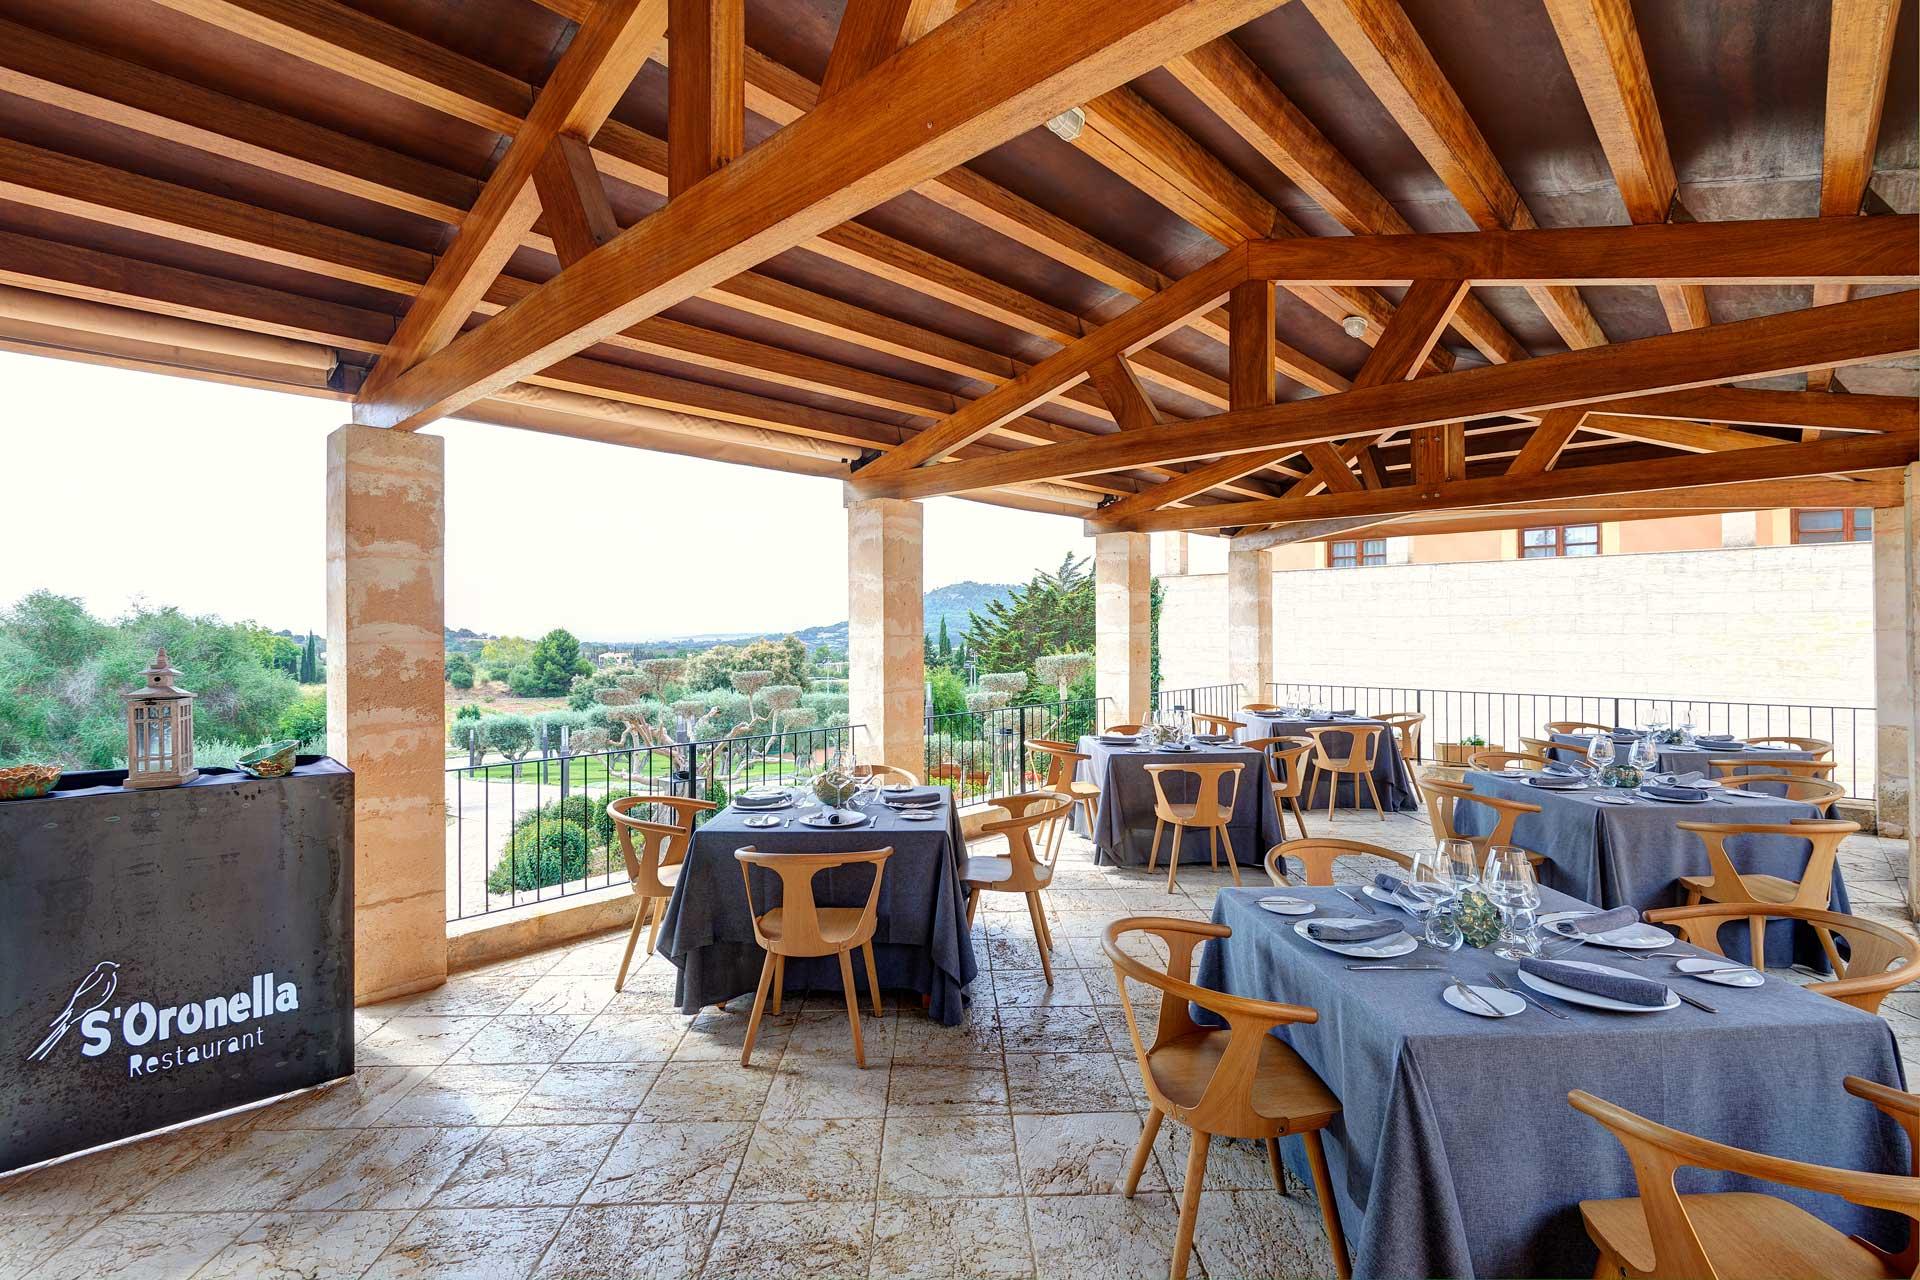 Finca-Hotel Sentido Pula Suites - Restaurant terrace S'Oronella